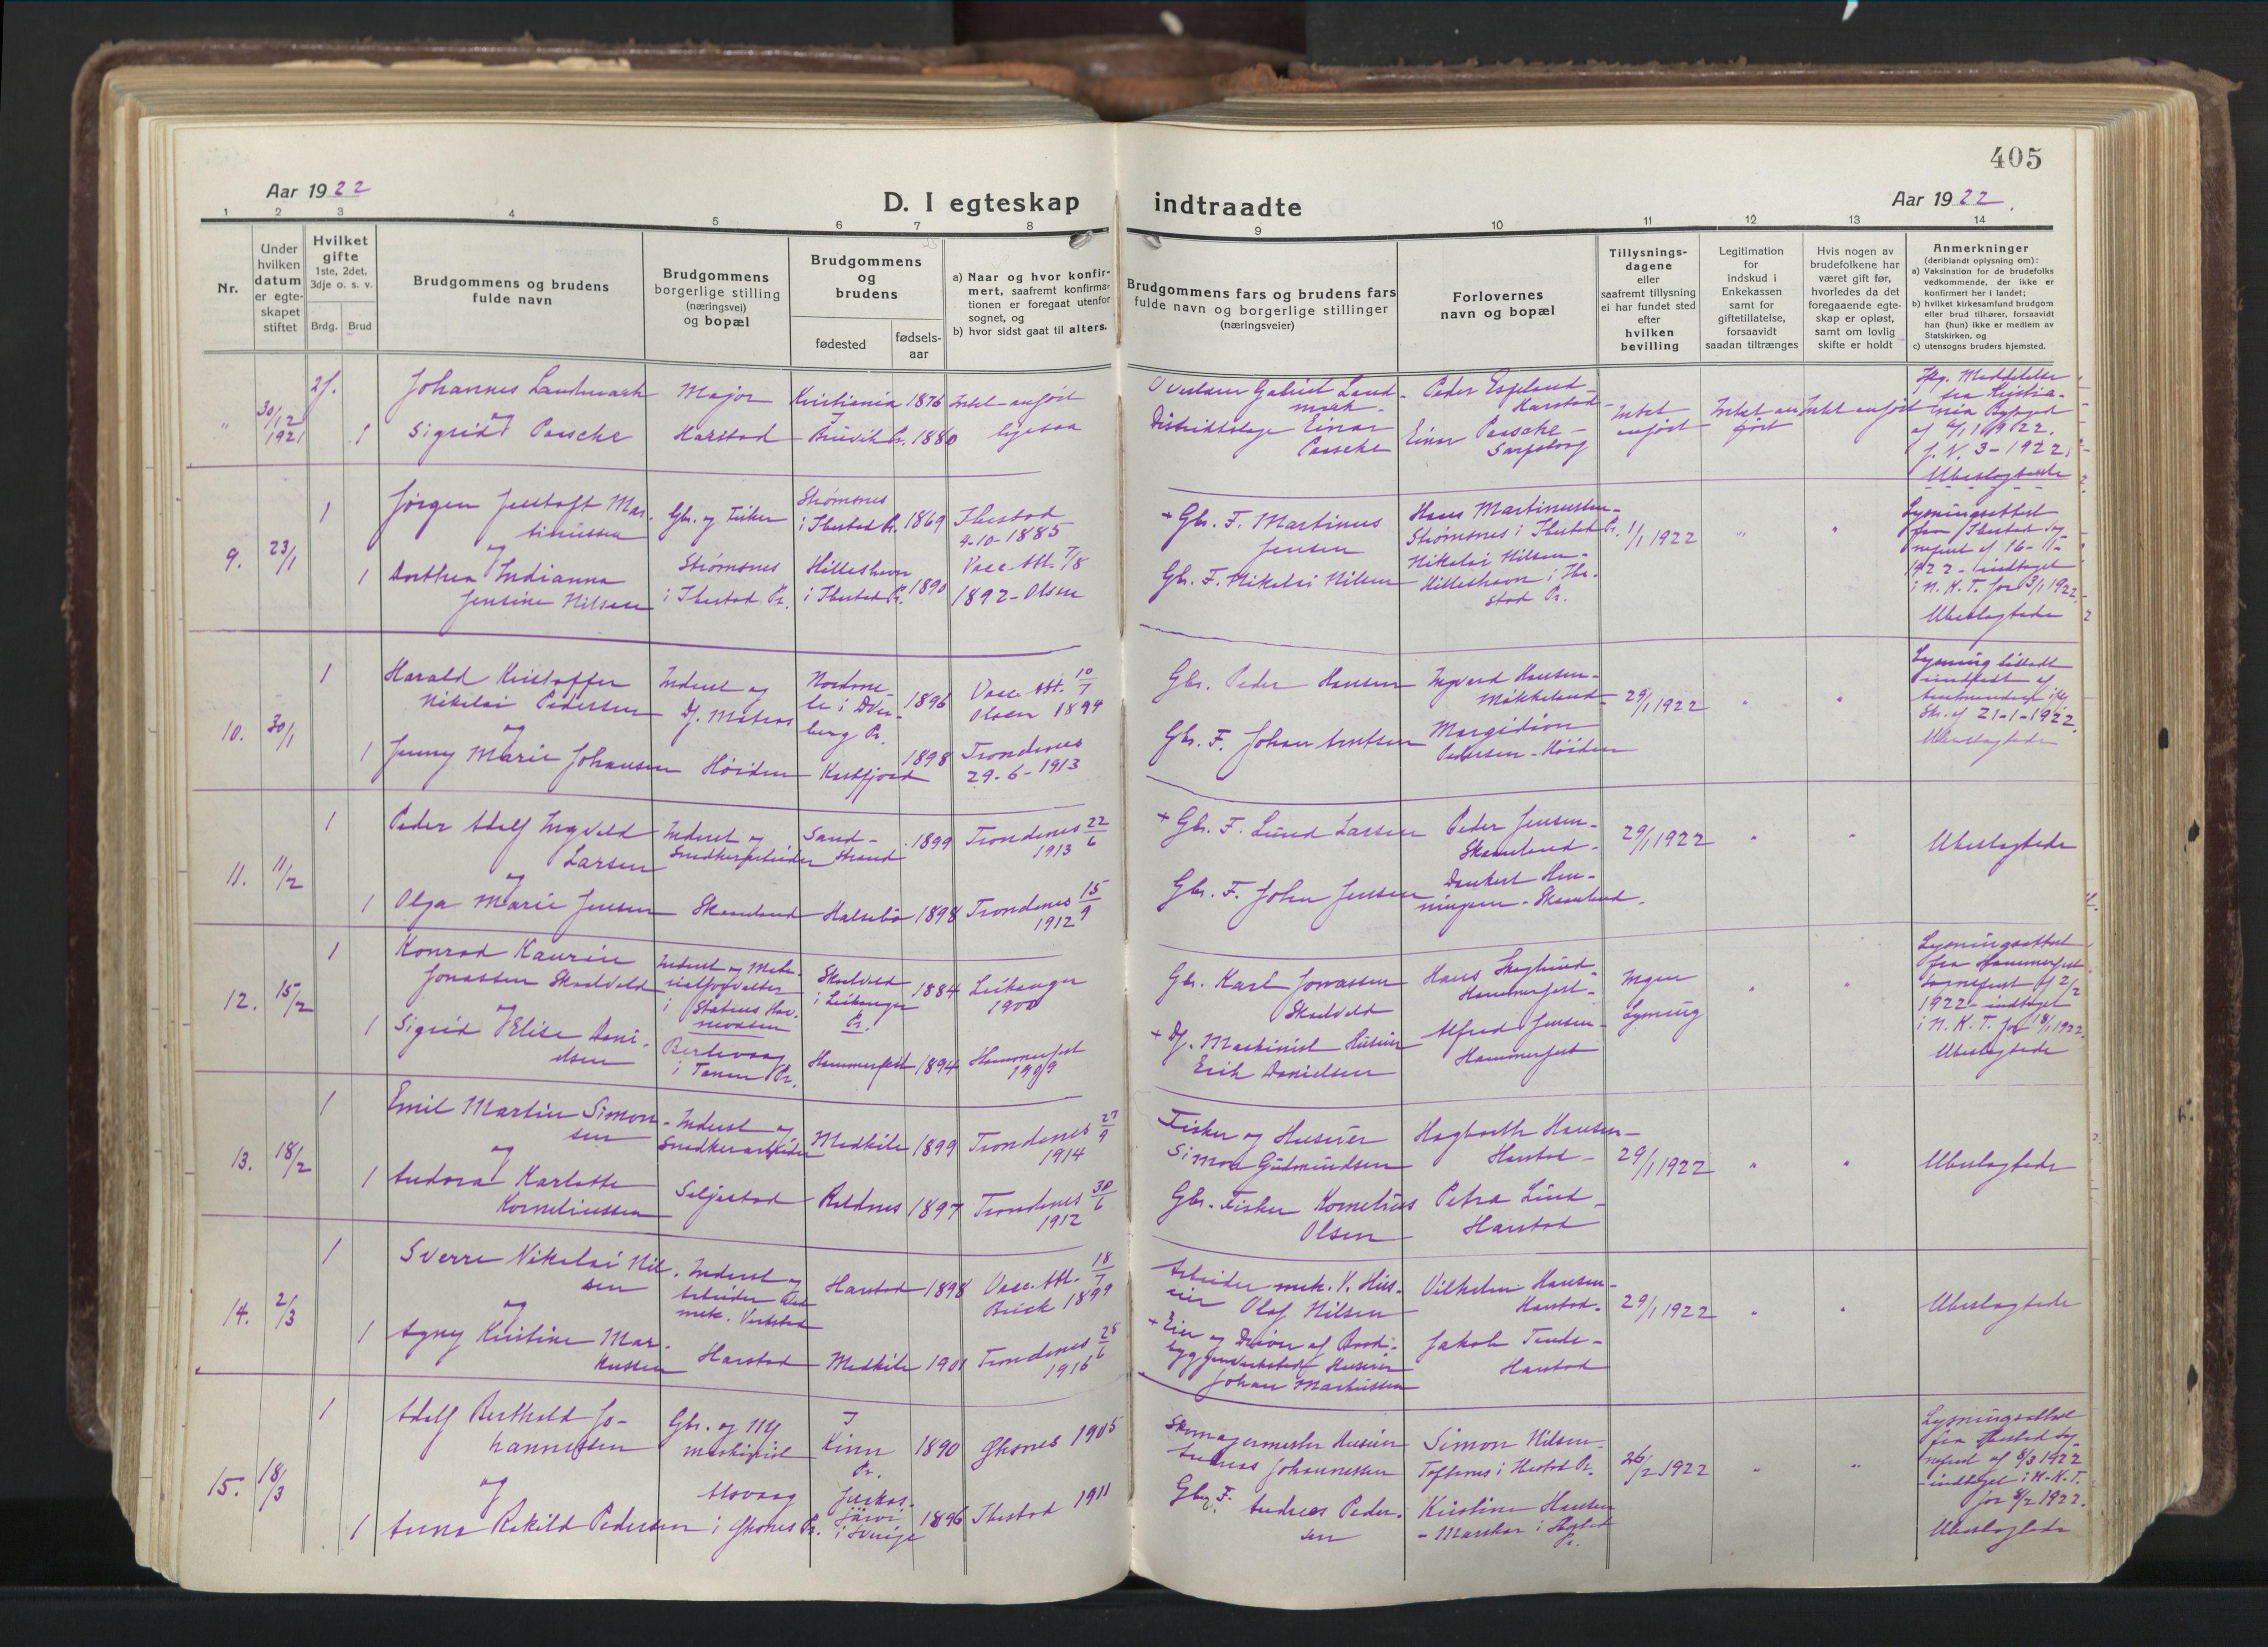 SATØ, Trondenes sokneprestkontor, H/Ha/L0019kirke: Parish register (official) no. 19, 1919-1928, p. 405